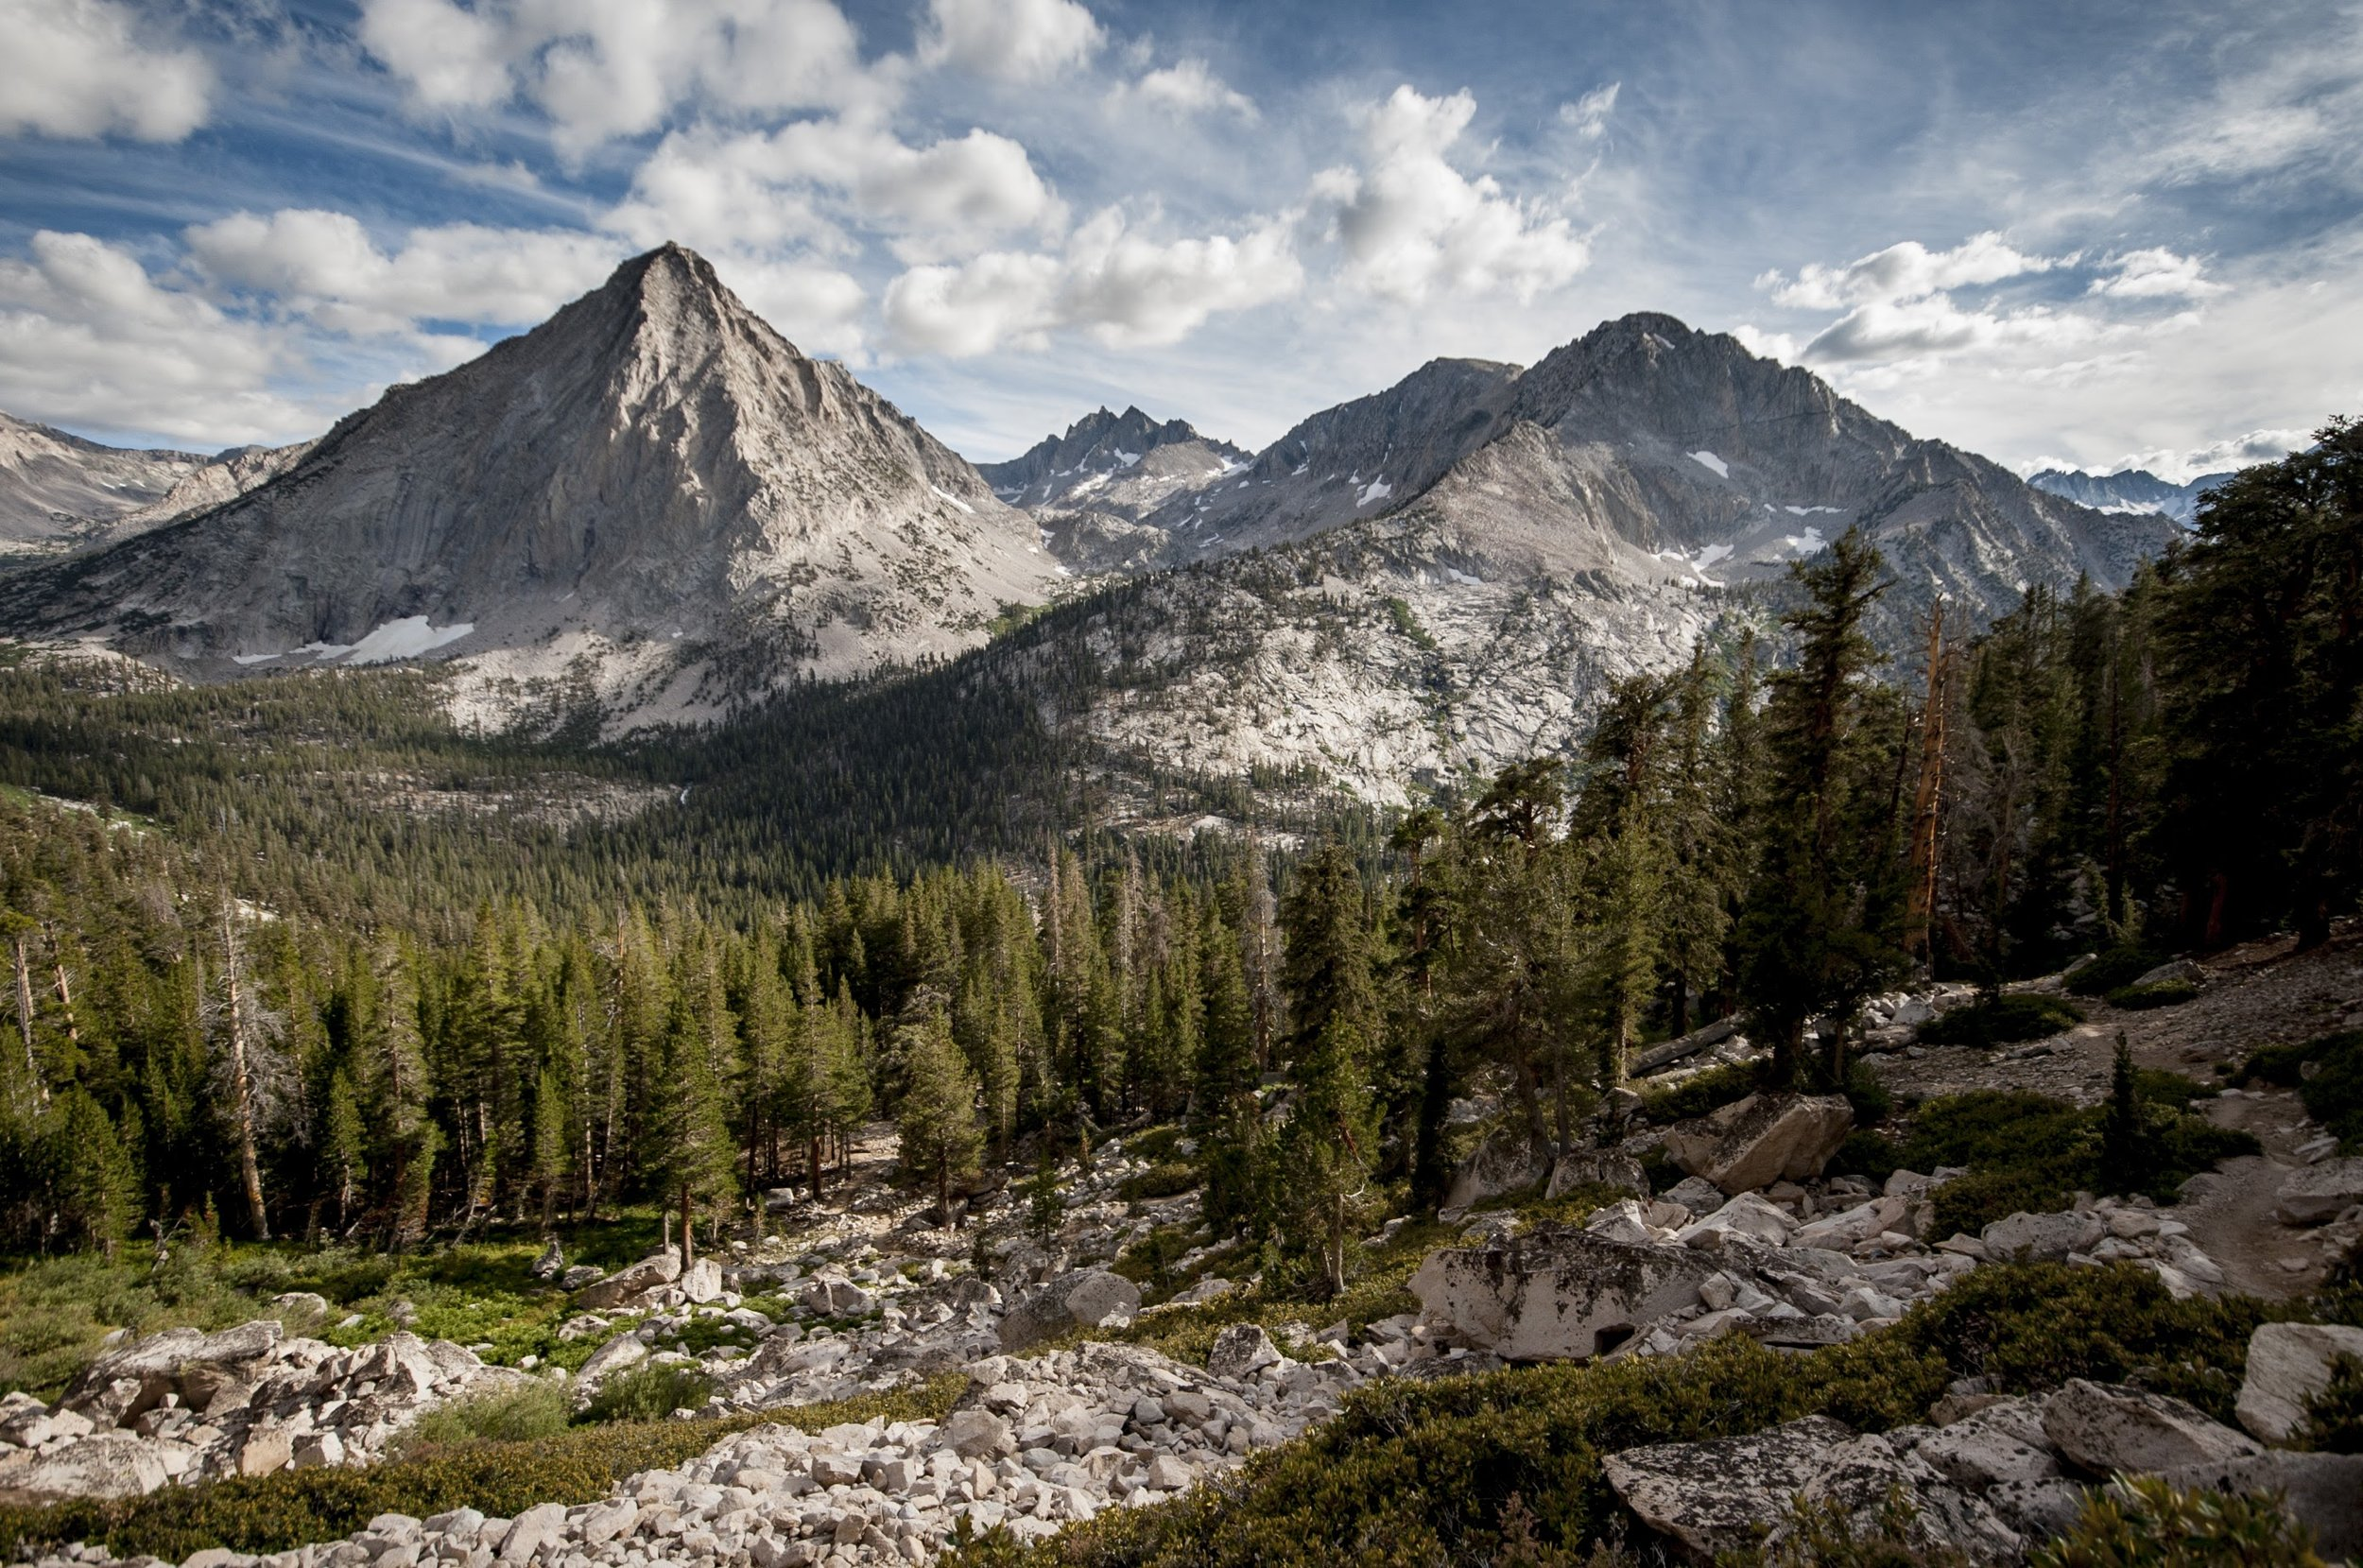 The Eastern Sierra.